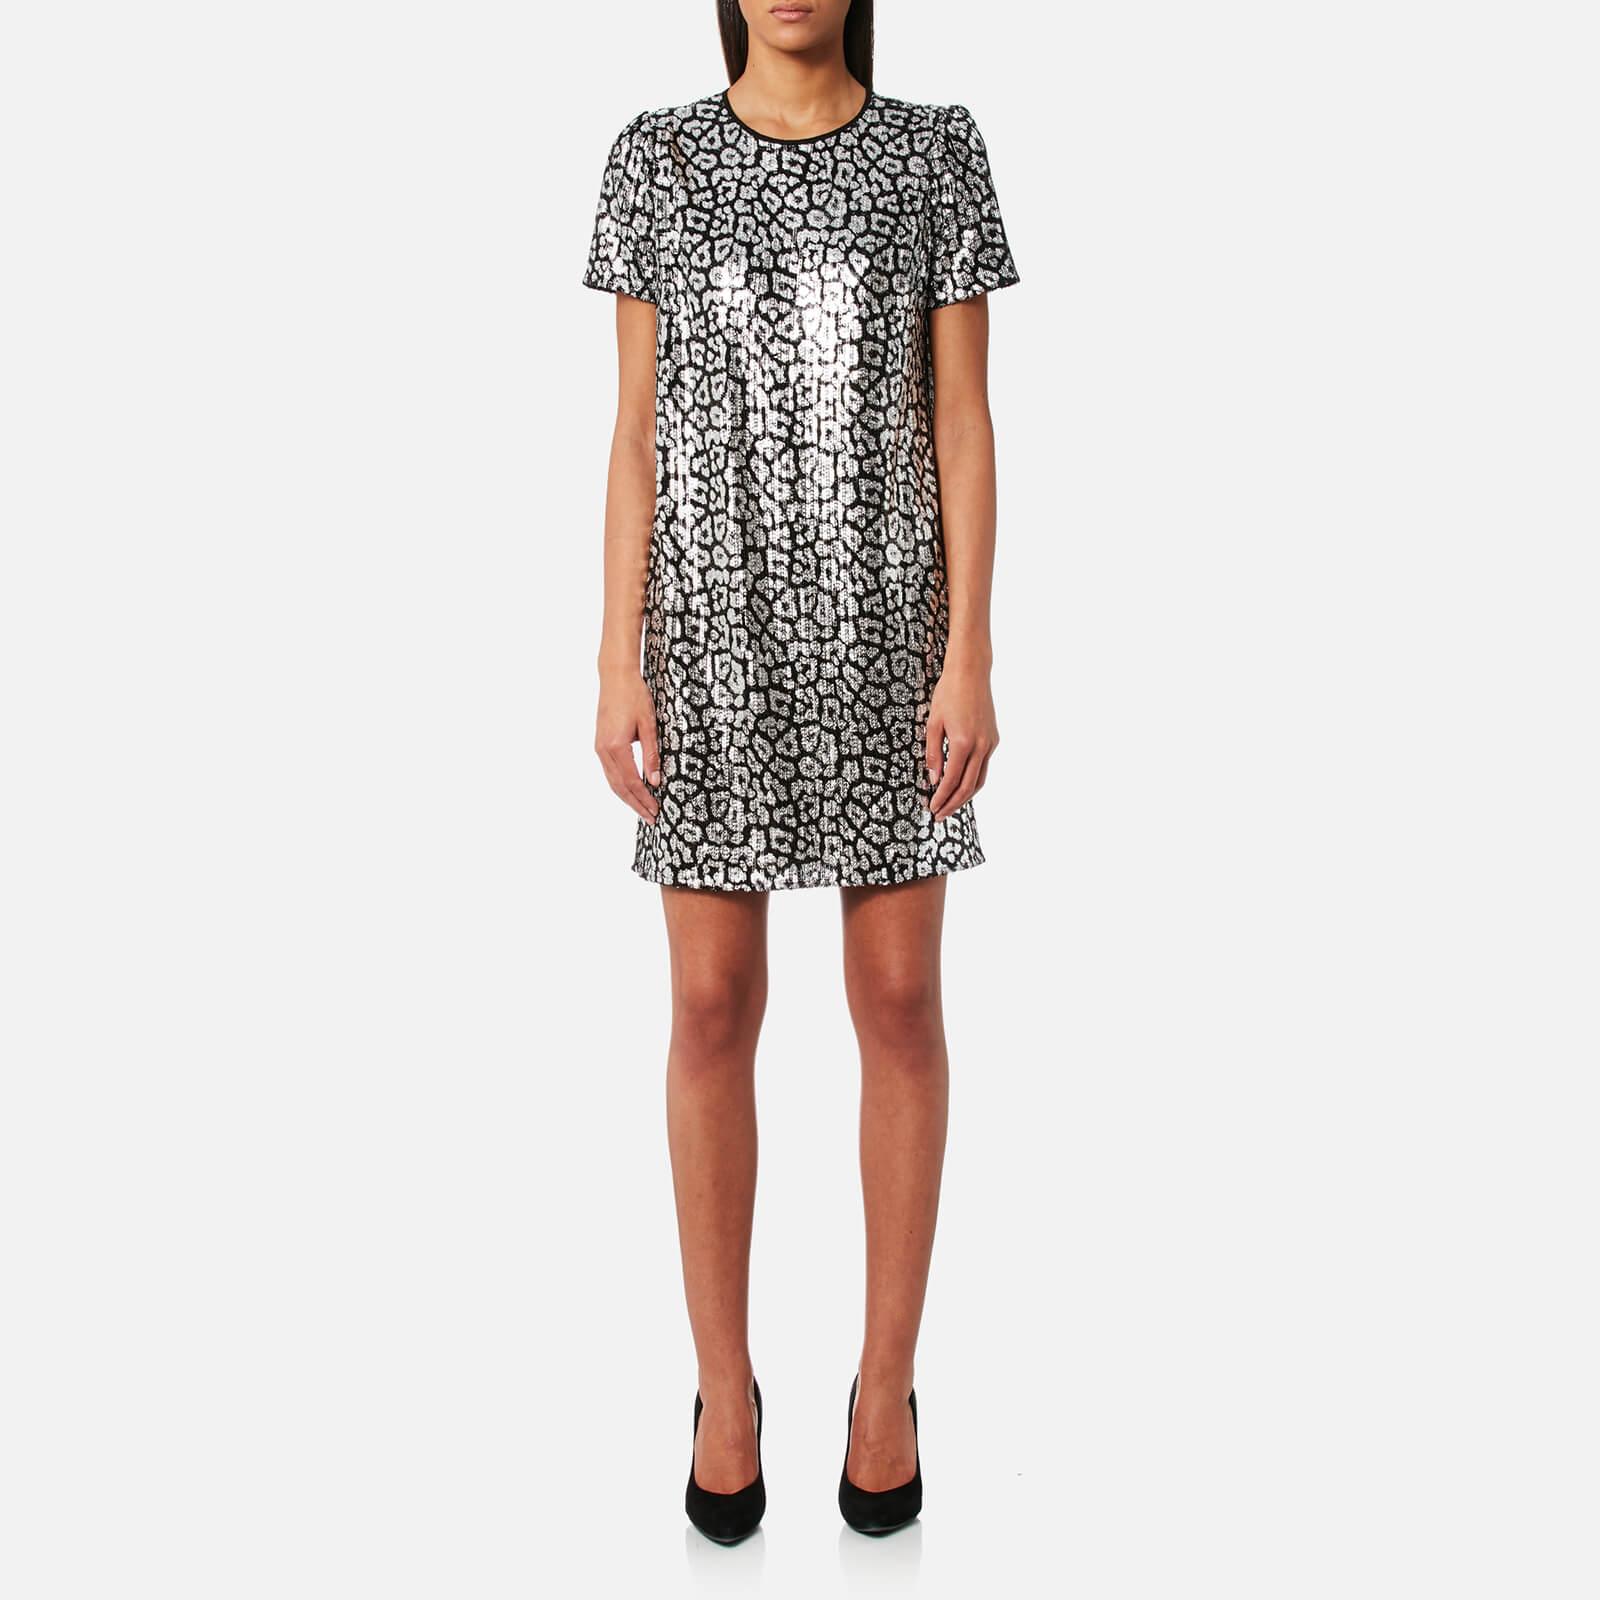 aa3e884e5b4 MICHAEL MICHAEL KORS Women s Sequin Tulle Dress - Black Silver - Free UK  Delivery over £50